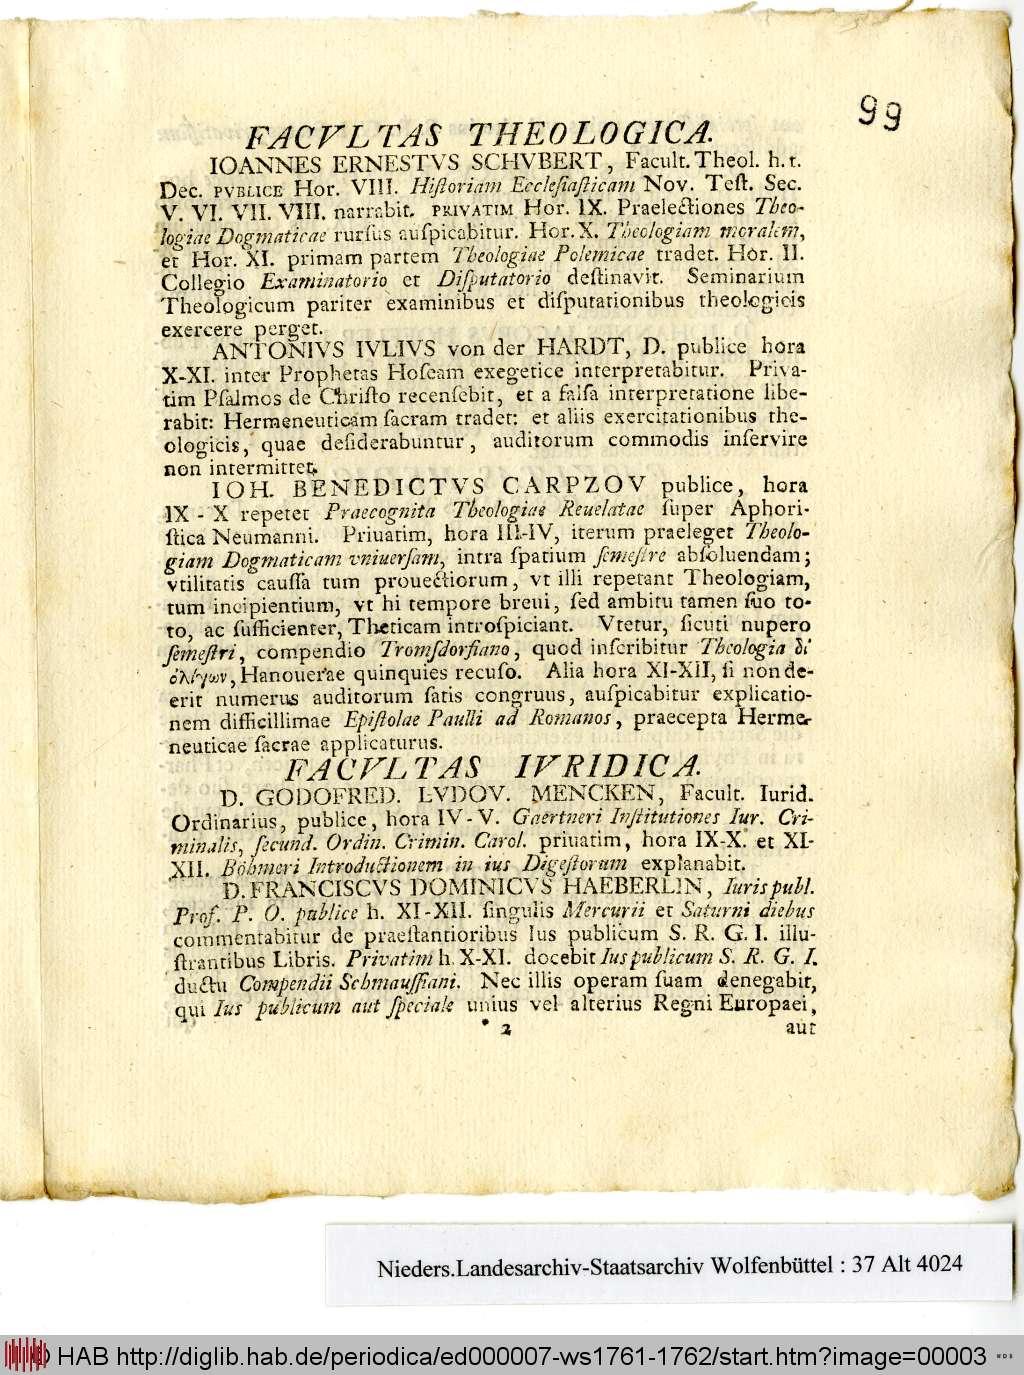 https://diglib.hab.de/periodica/ed000007-ws1761-1762/00003.jpg